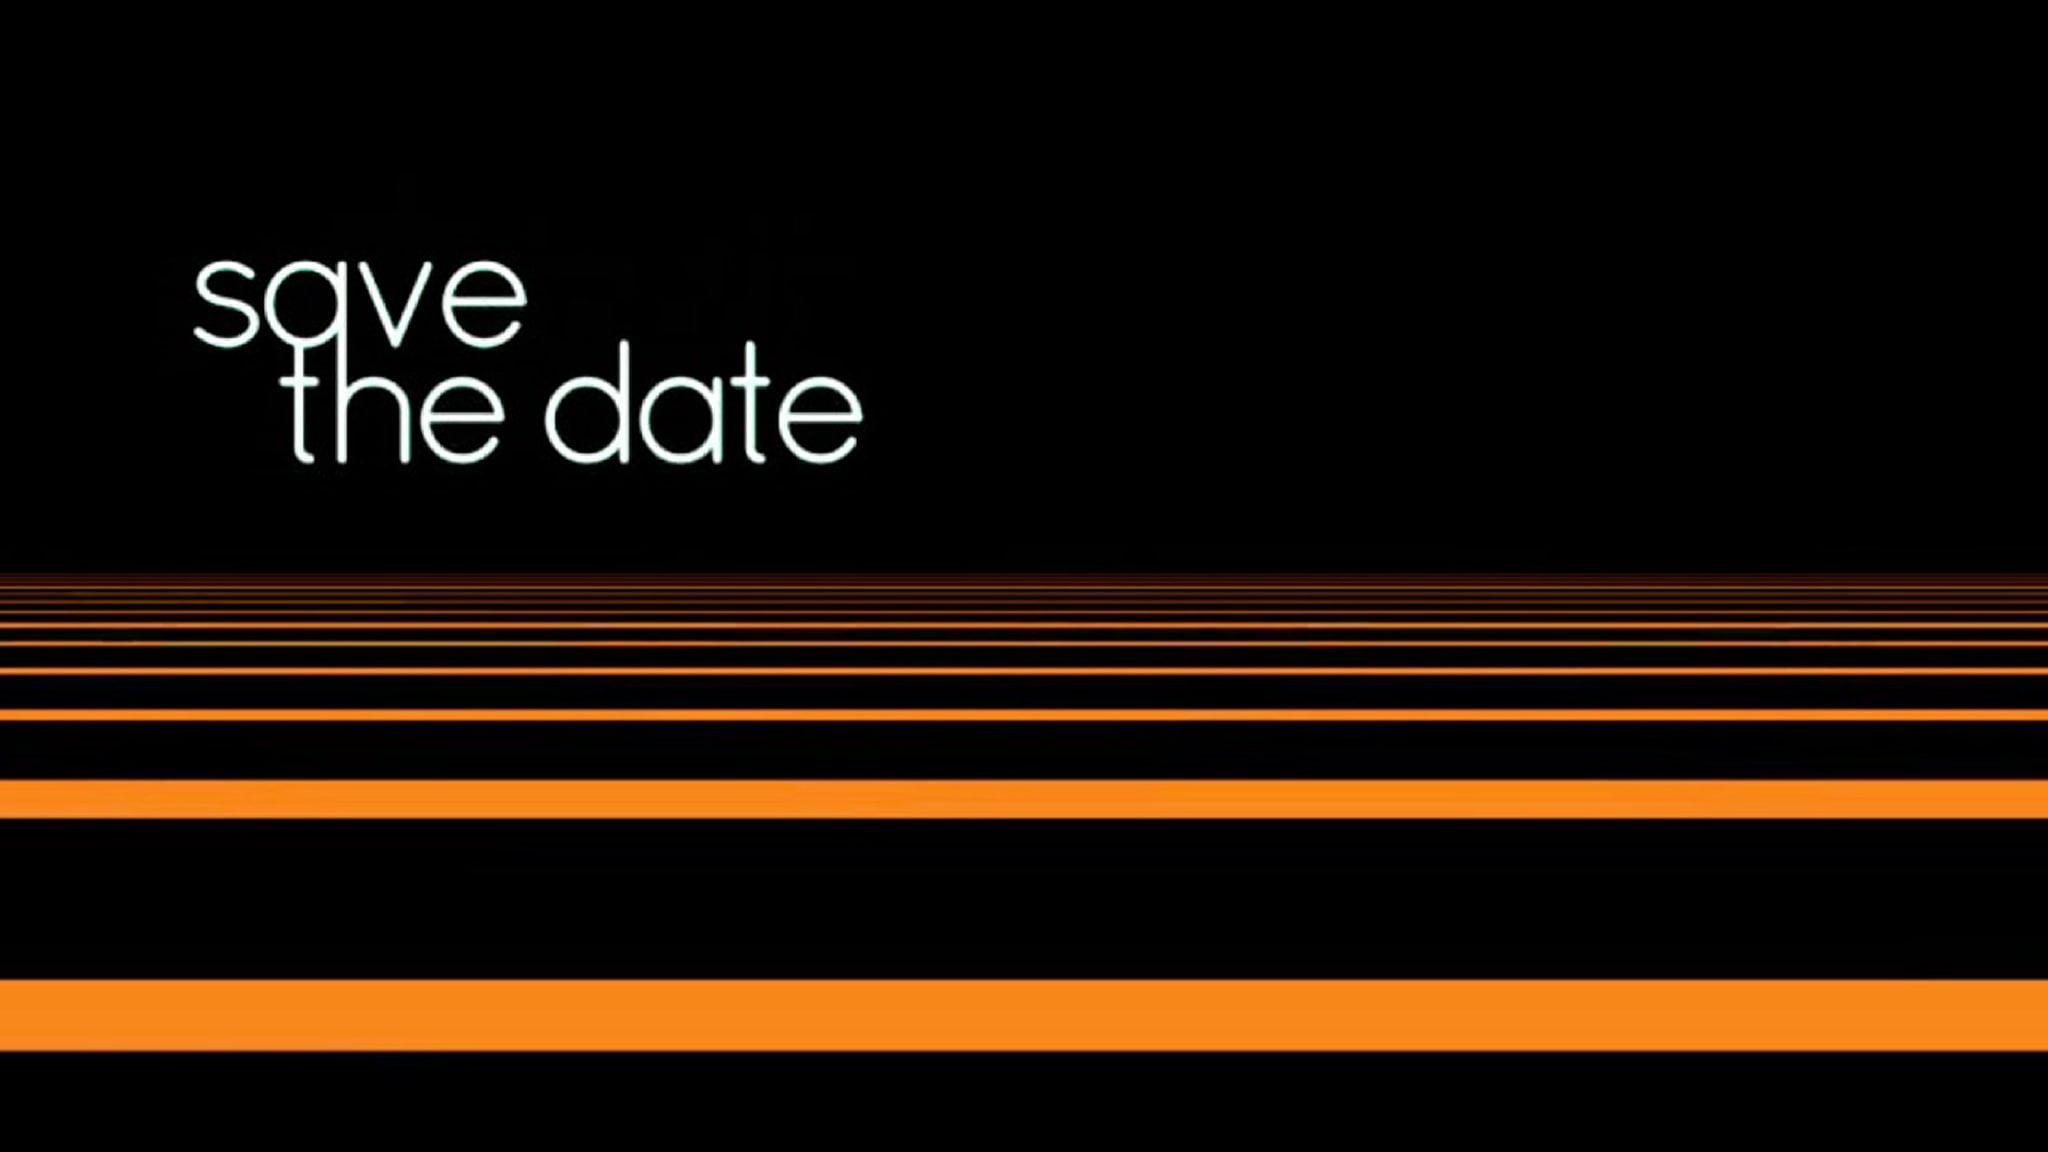 Rai 5 Save the Date - Speciale #laculturanonsiferma